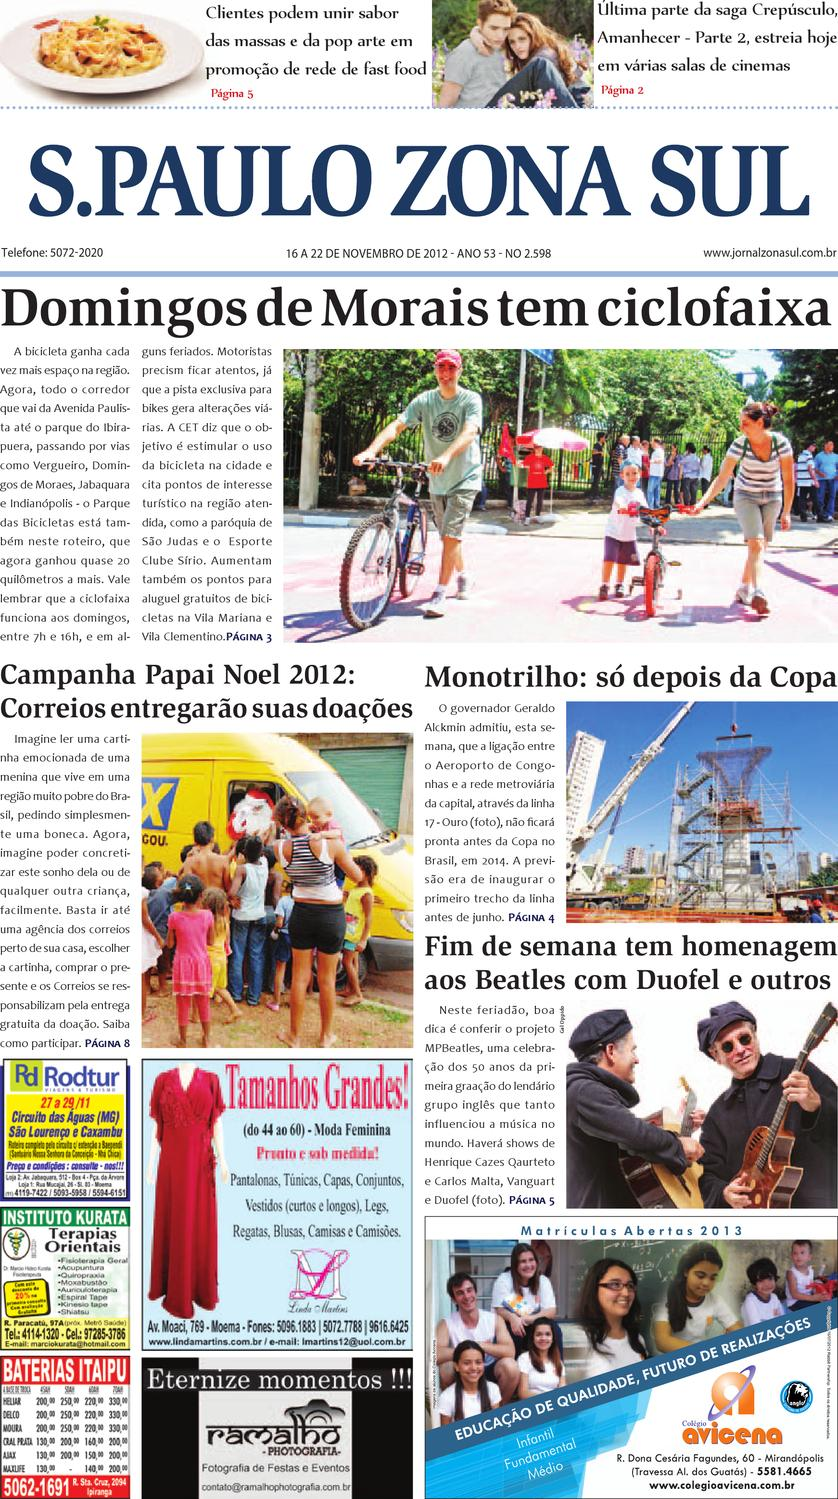 a69a77990 16 a 22 de novembro de 2012 - Jornal São Paulo Zona Sul by Jornal Zona Sul  - issuu